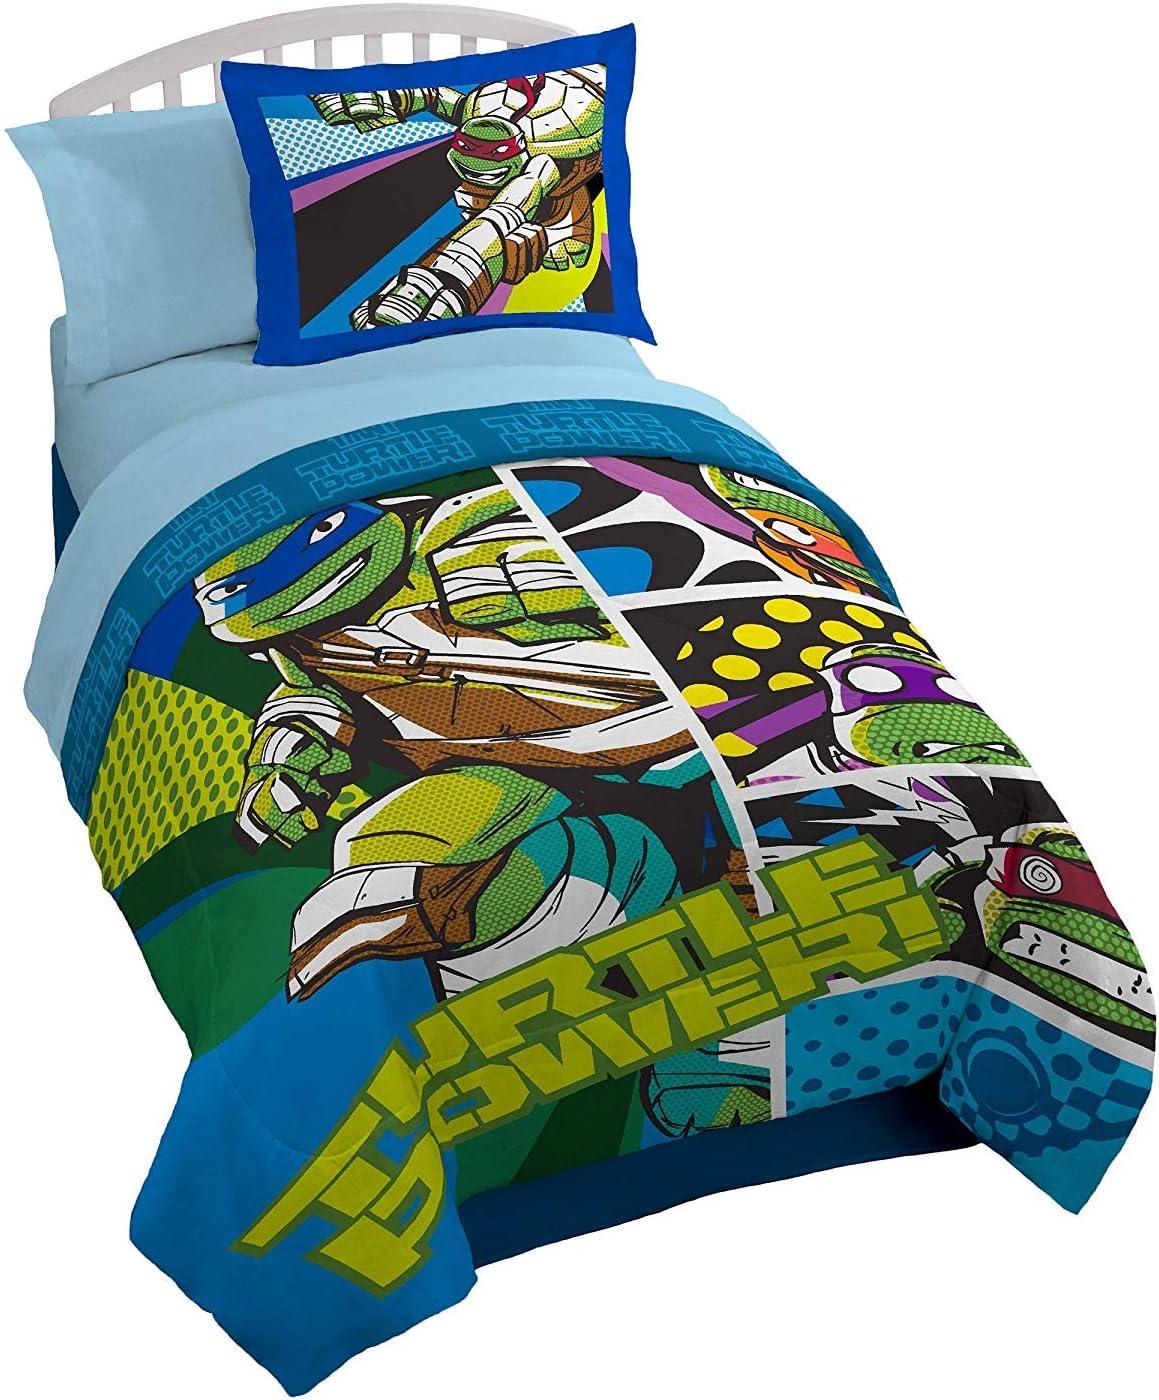 Nickelodeon Teenage Mutant Ninja Turtles 5-Piece Twin Bedding Collection with Comforter, Sheet Set, Pillowcase and Pillow Sham, TMNT